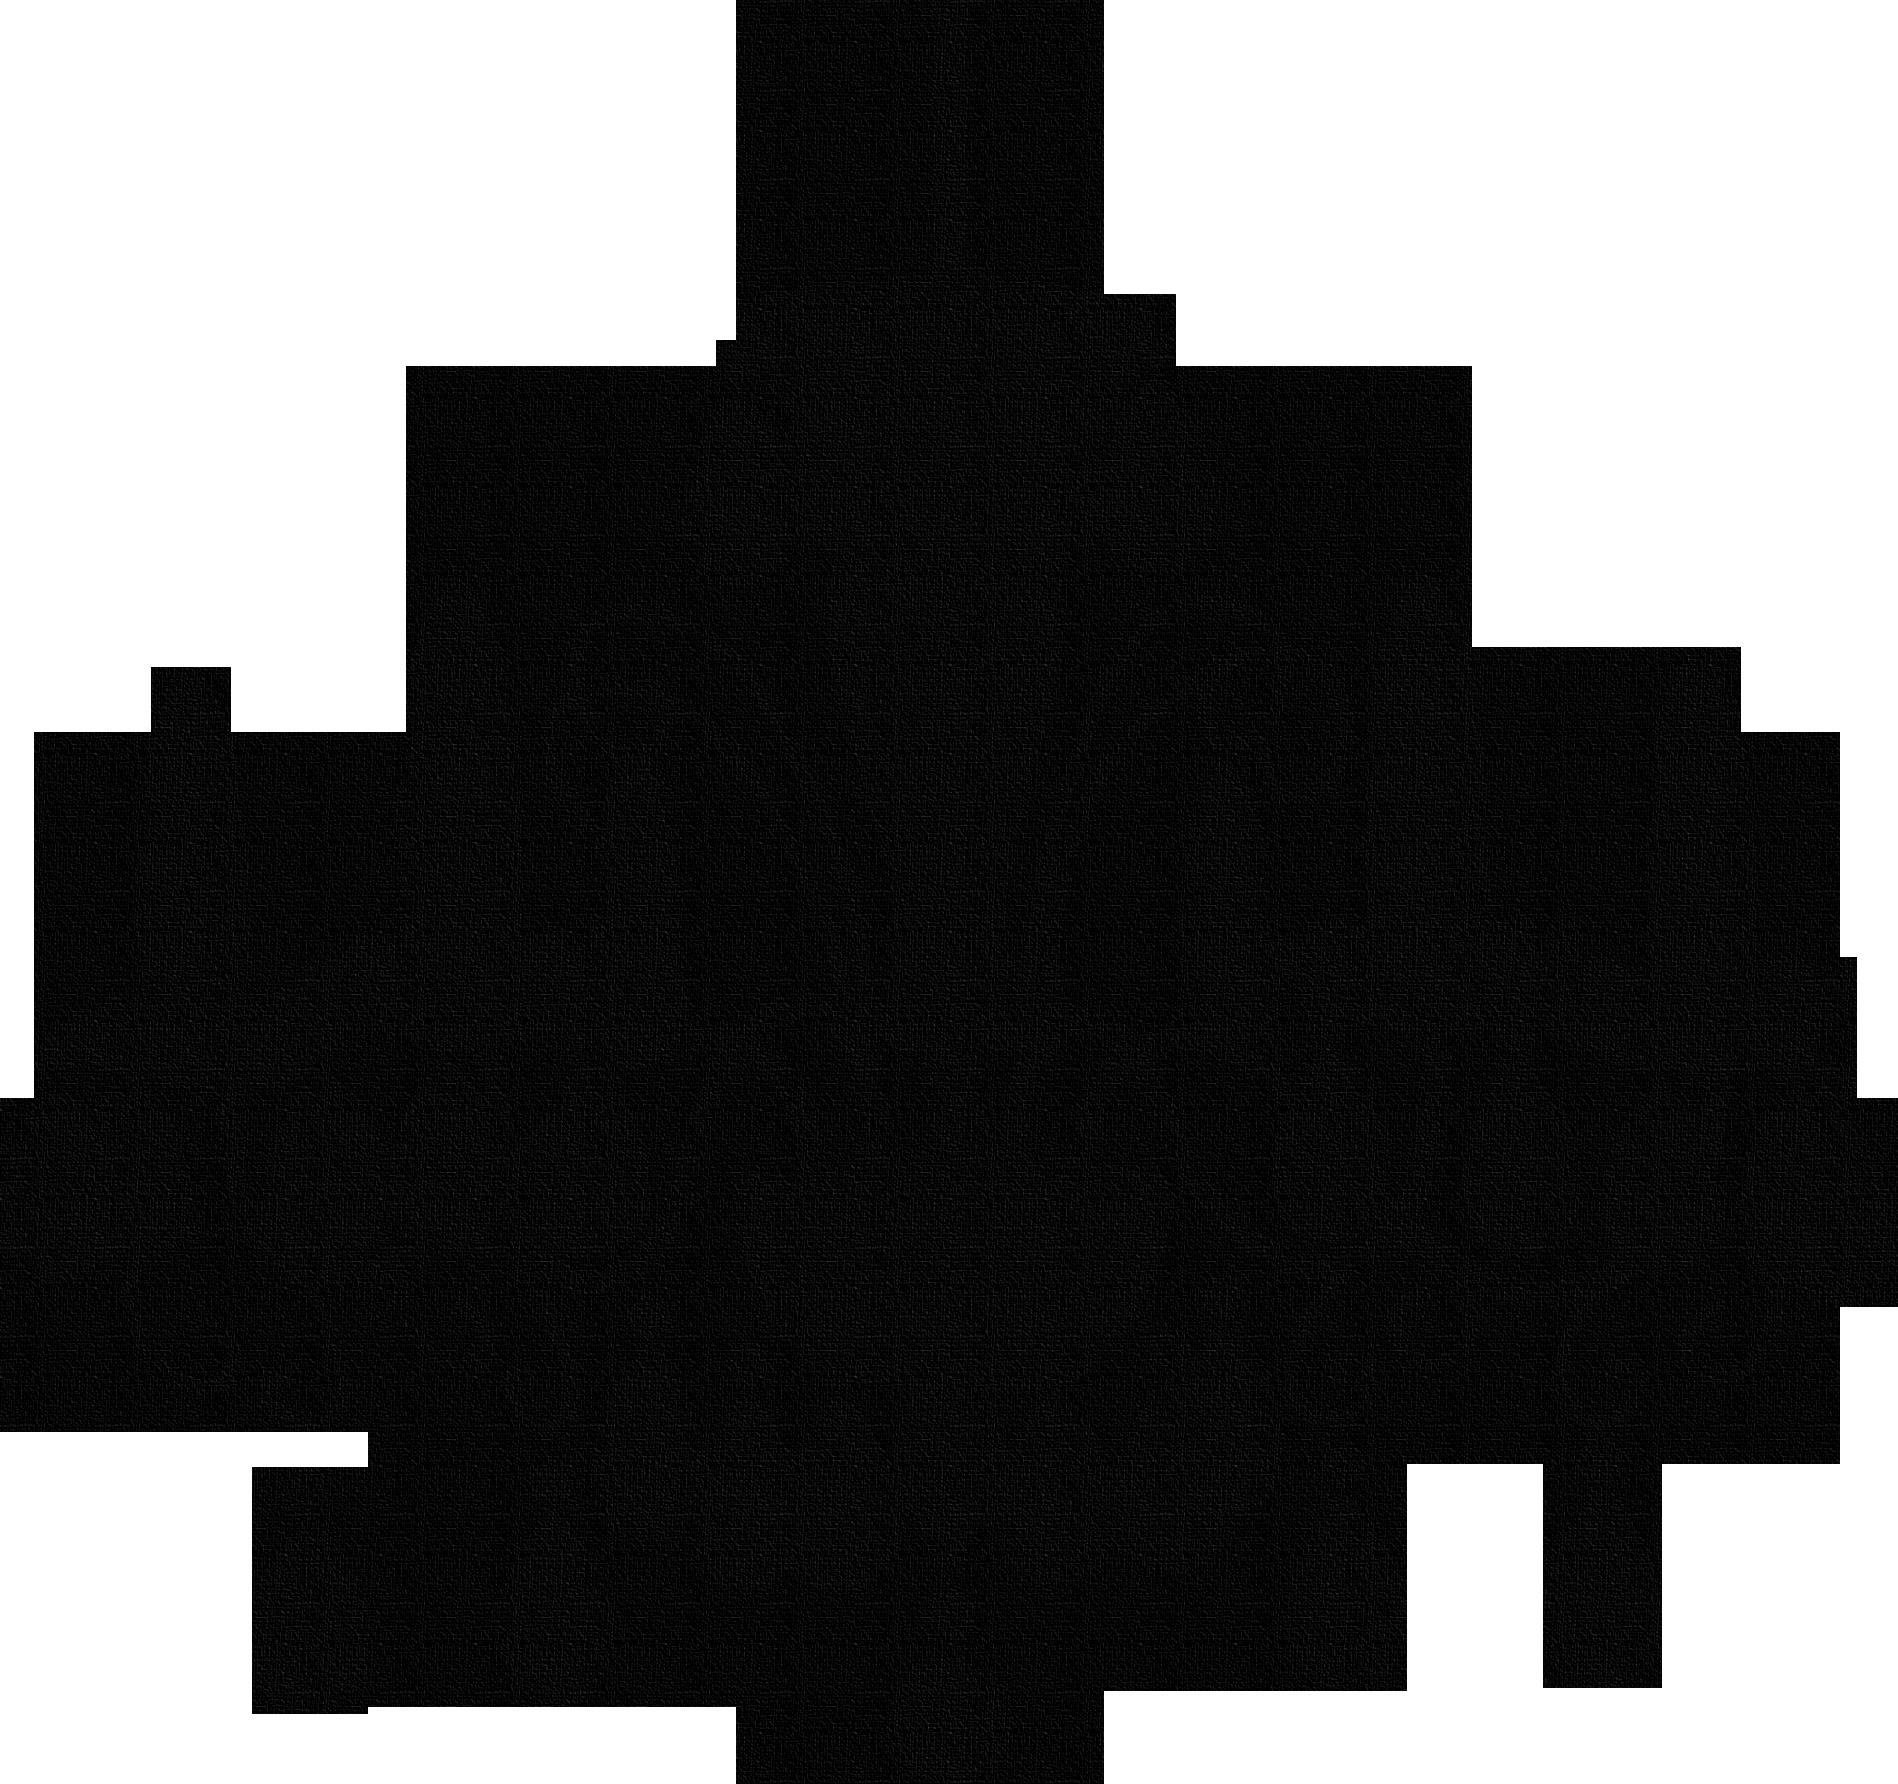 Chandelier silhouette by BerryKissed on DeviantArt